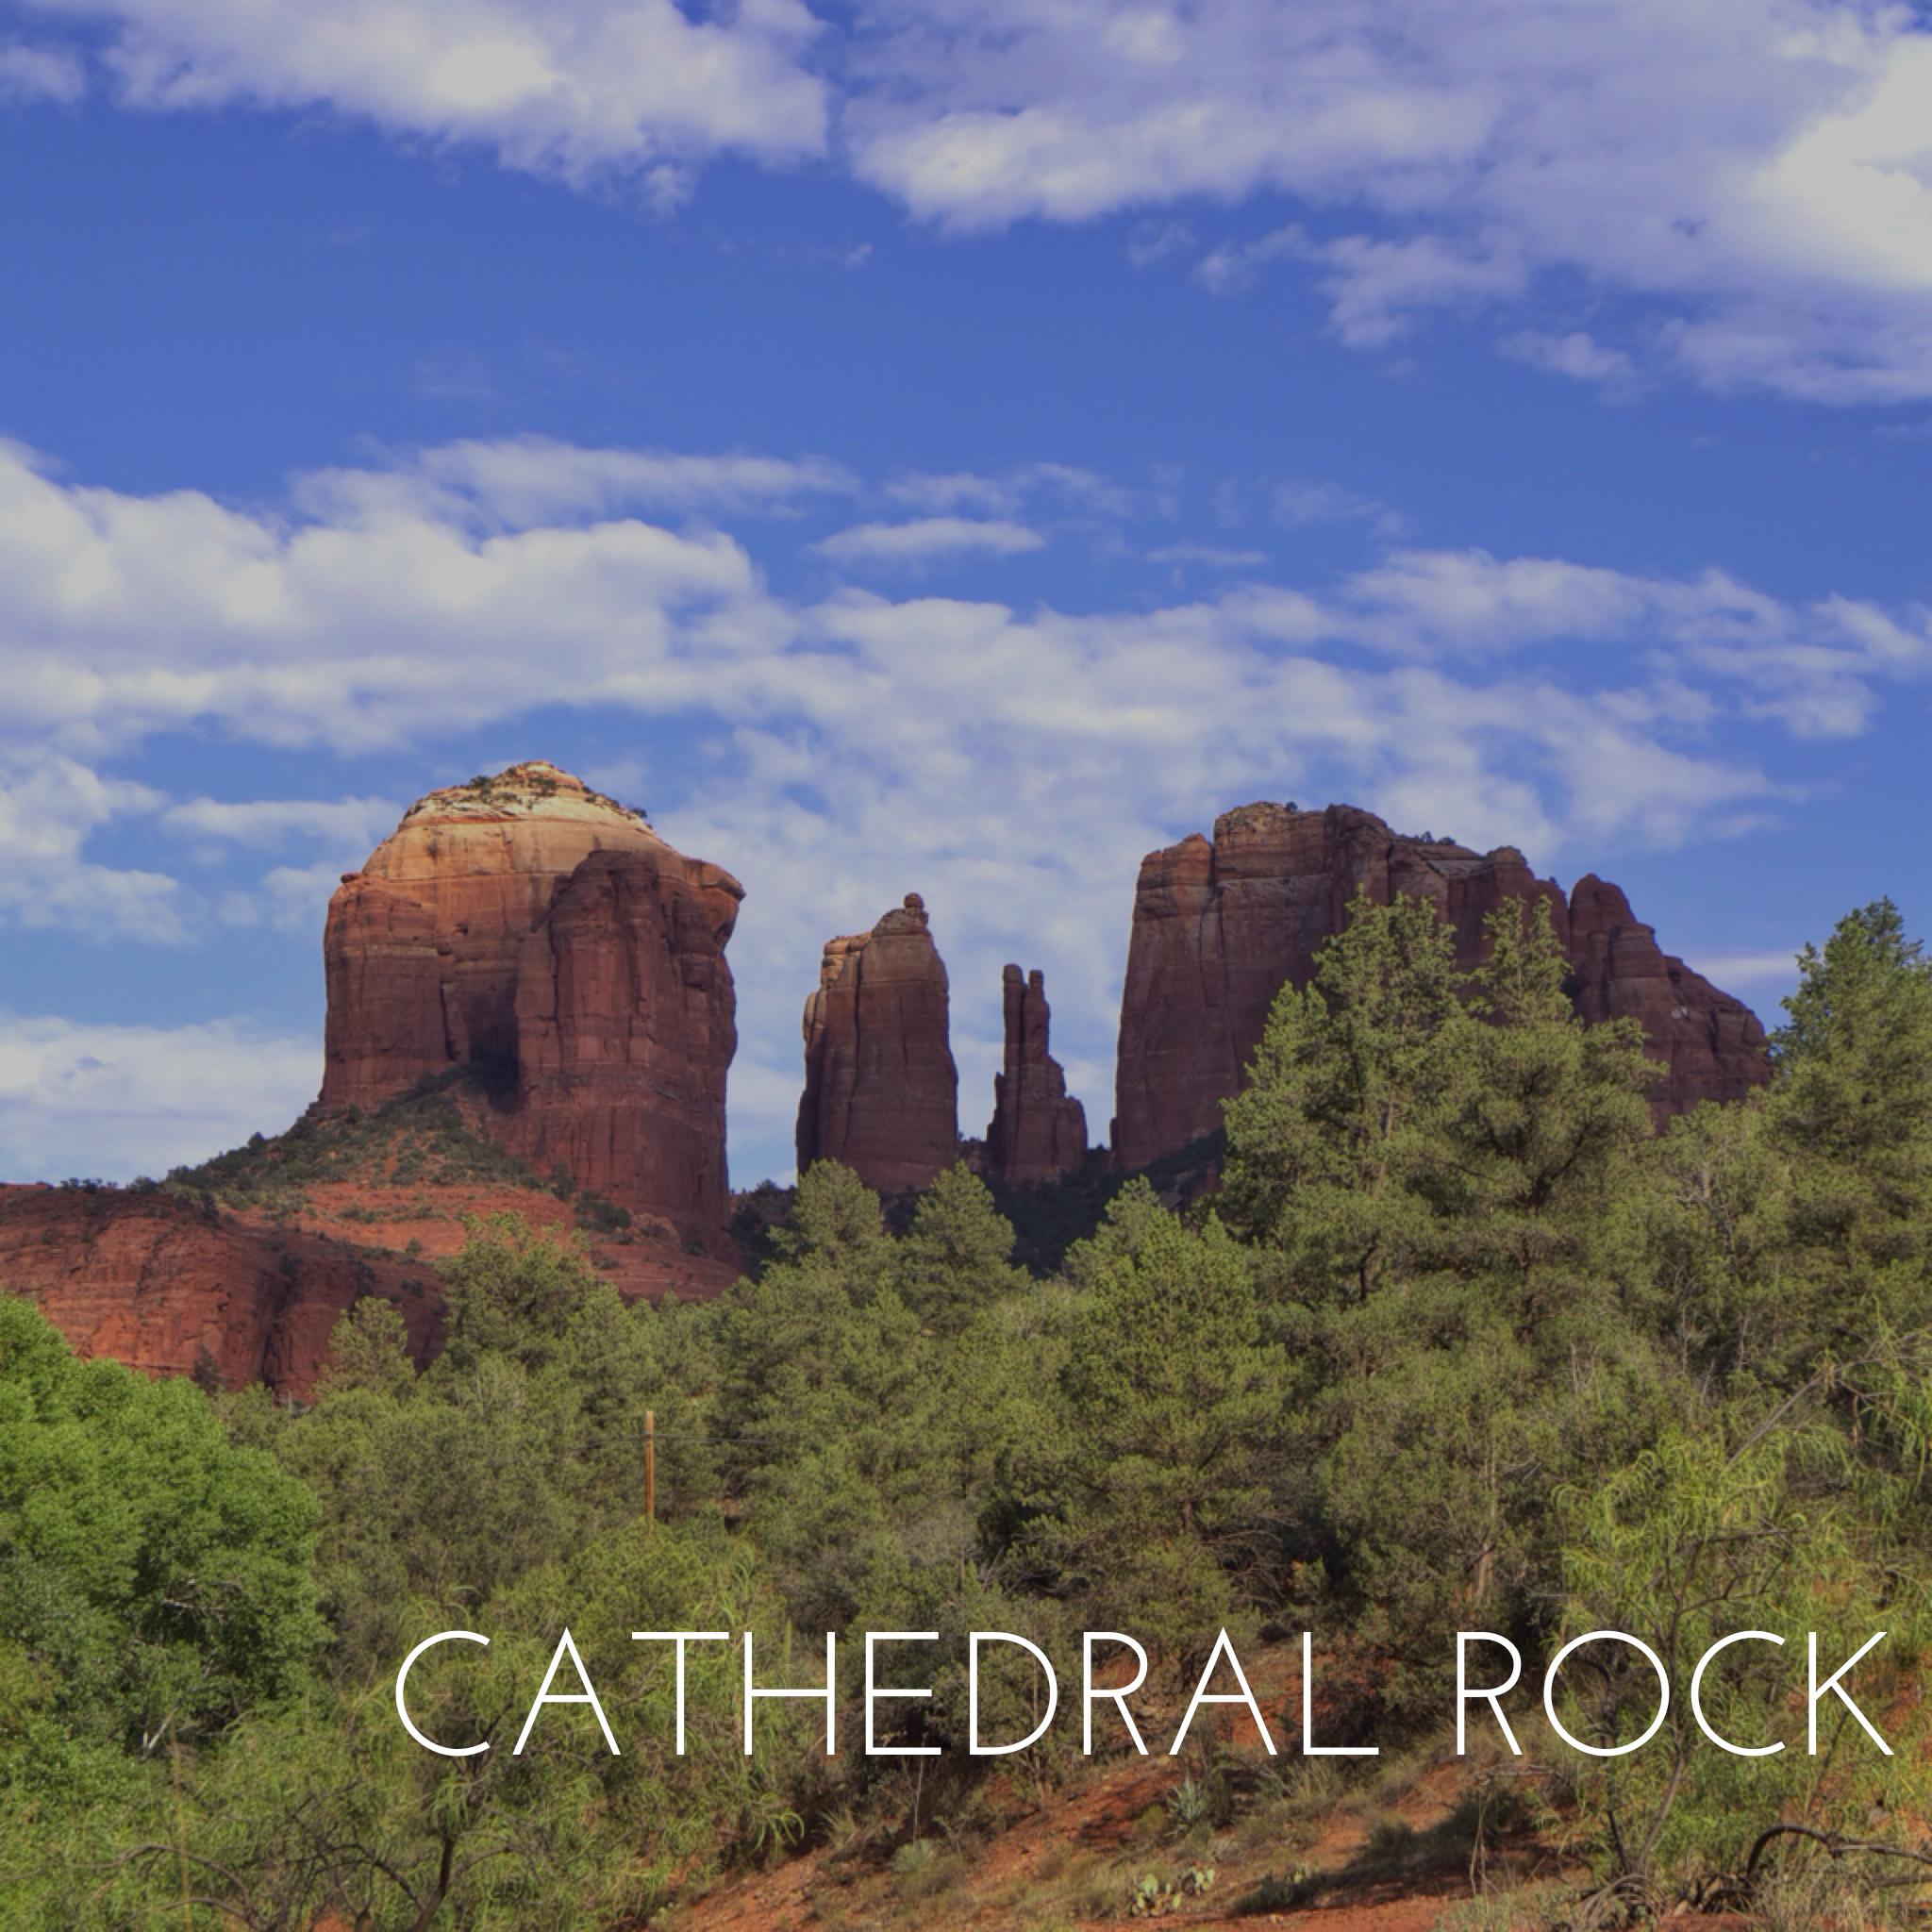 CathedralRockTitle.jpg